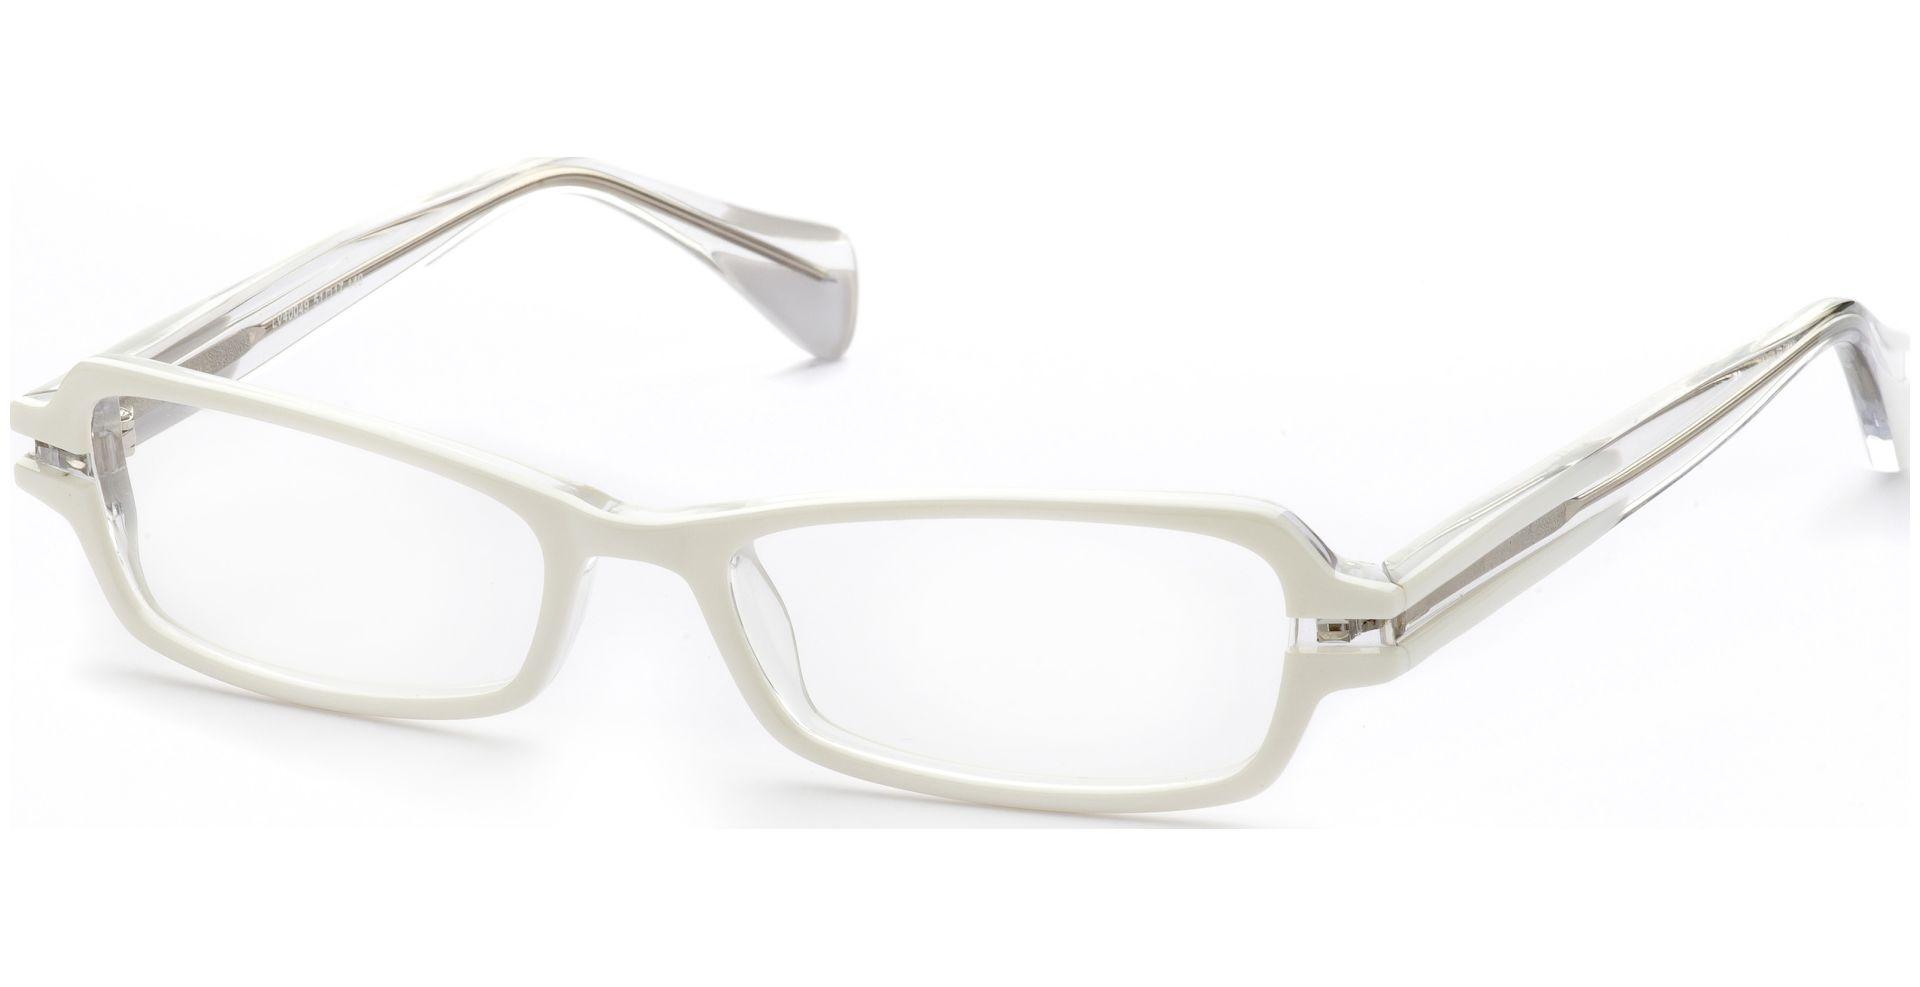 Lennox Eyewear - Keja weiß/transparent - von Lensbest